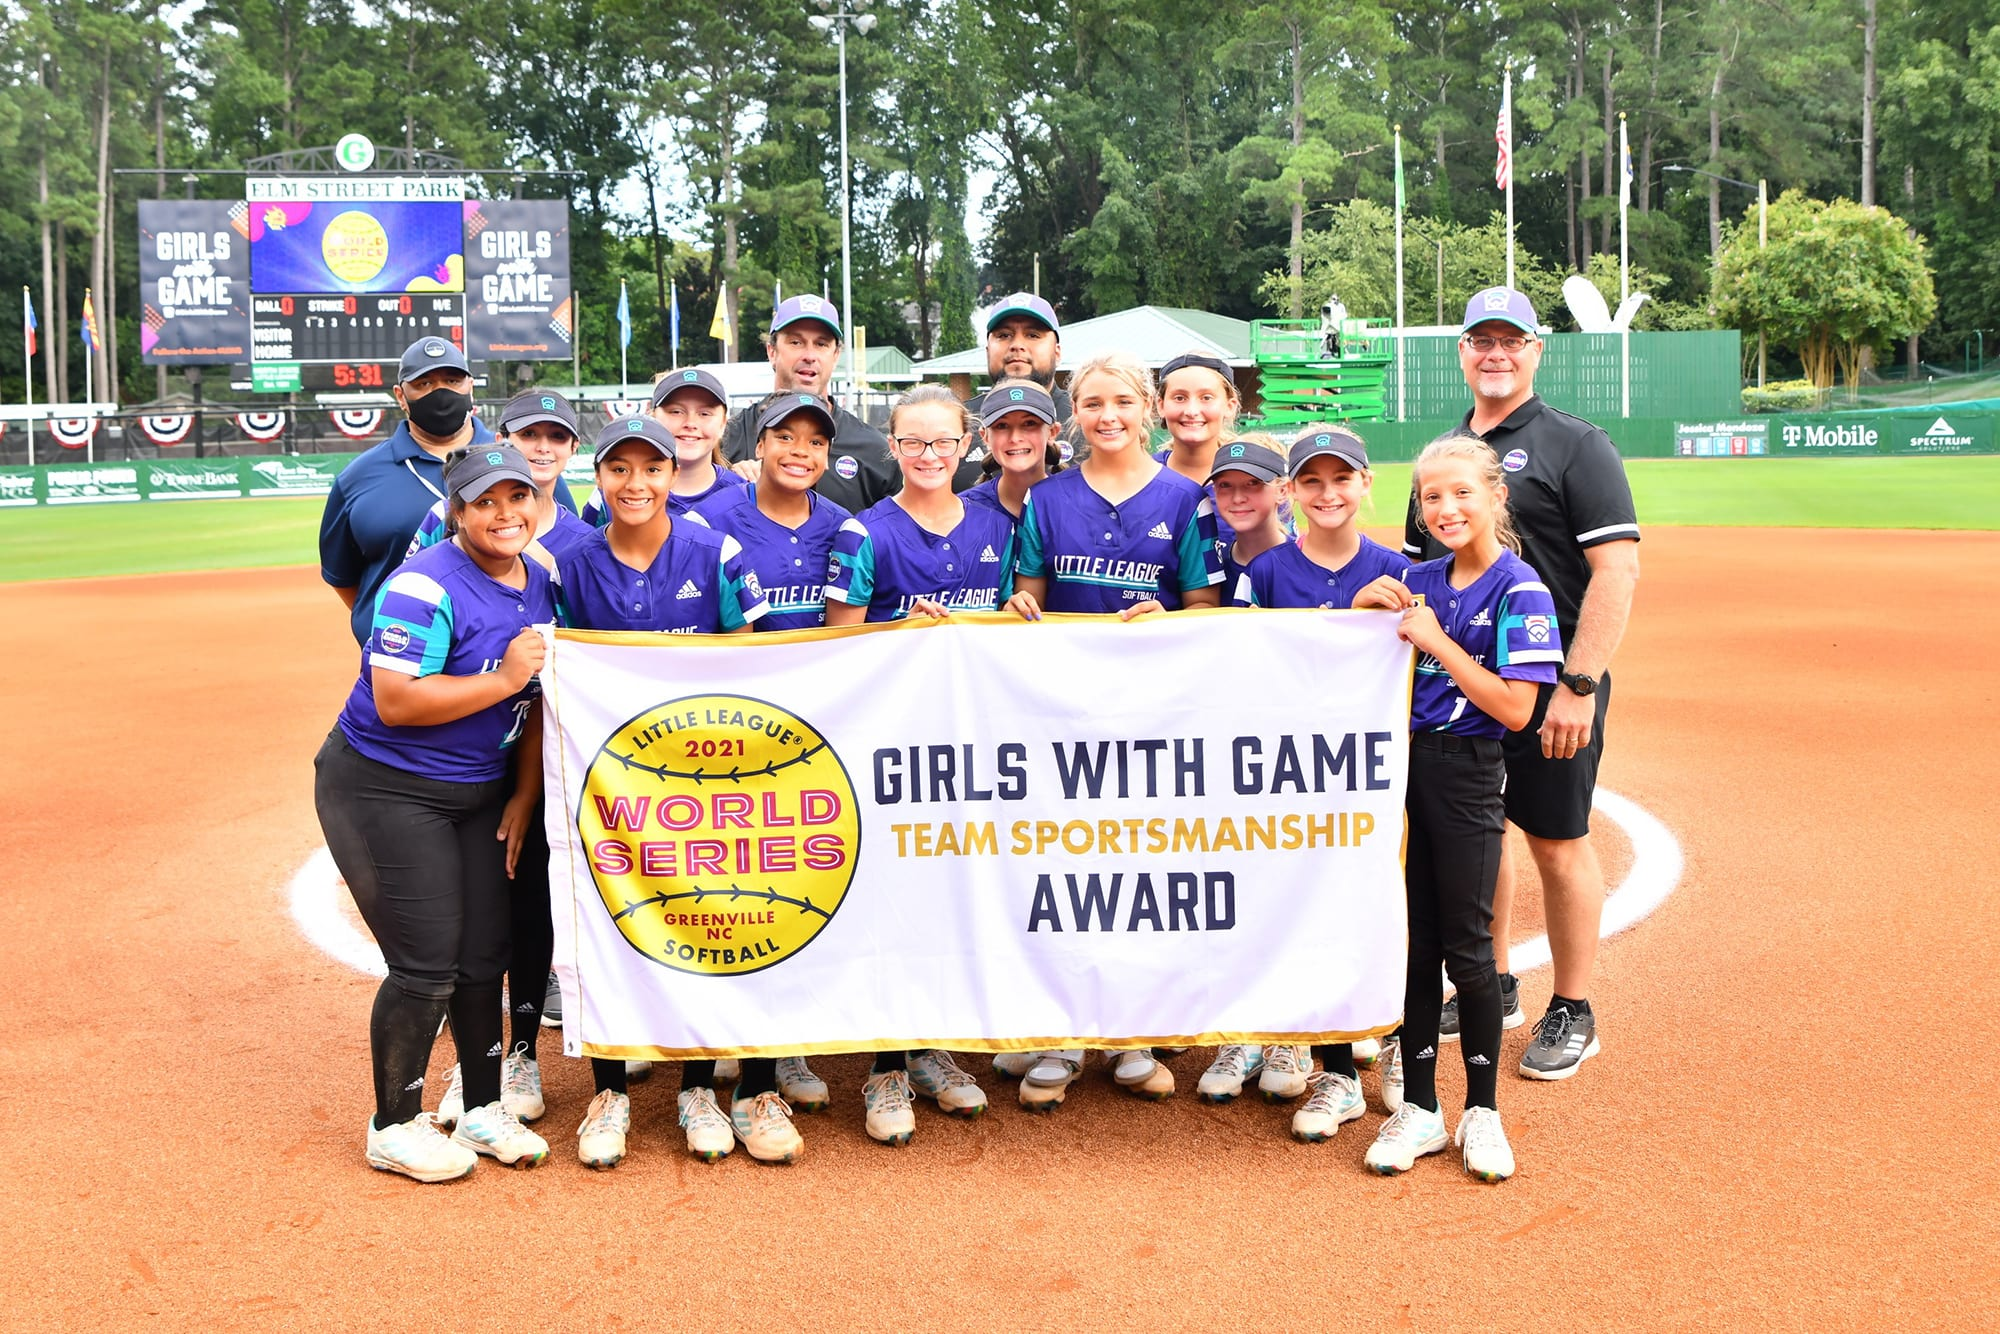 Girls with Game Team Sportsmanship Award